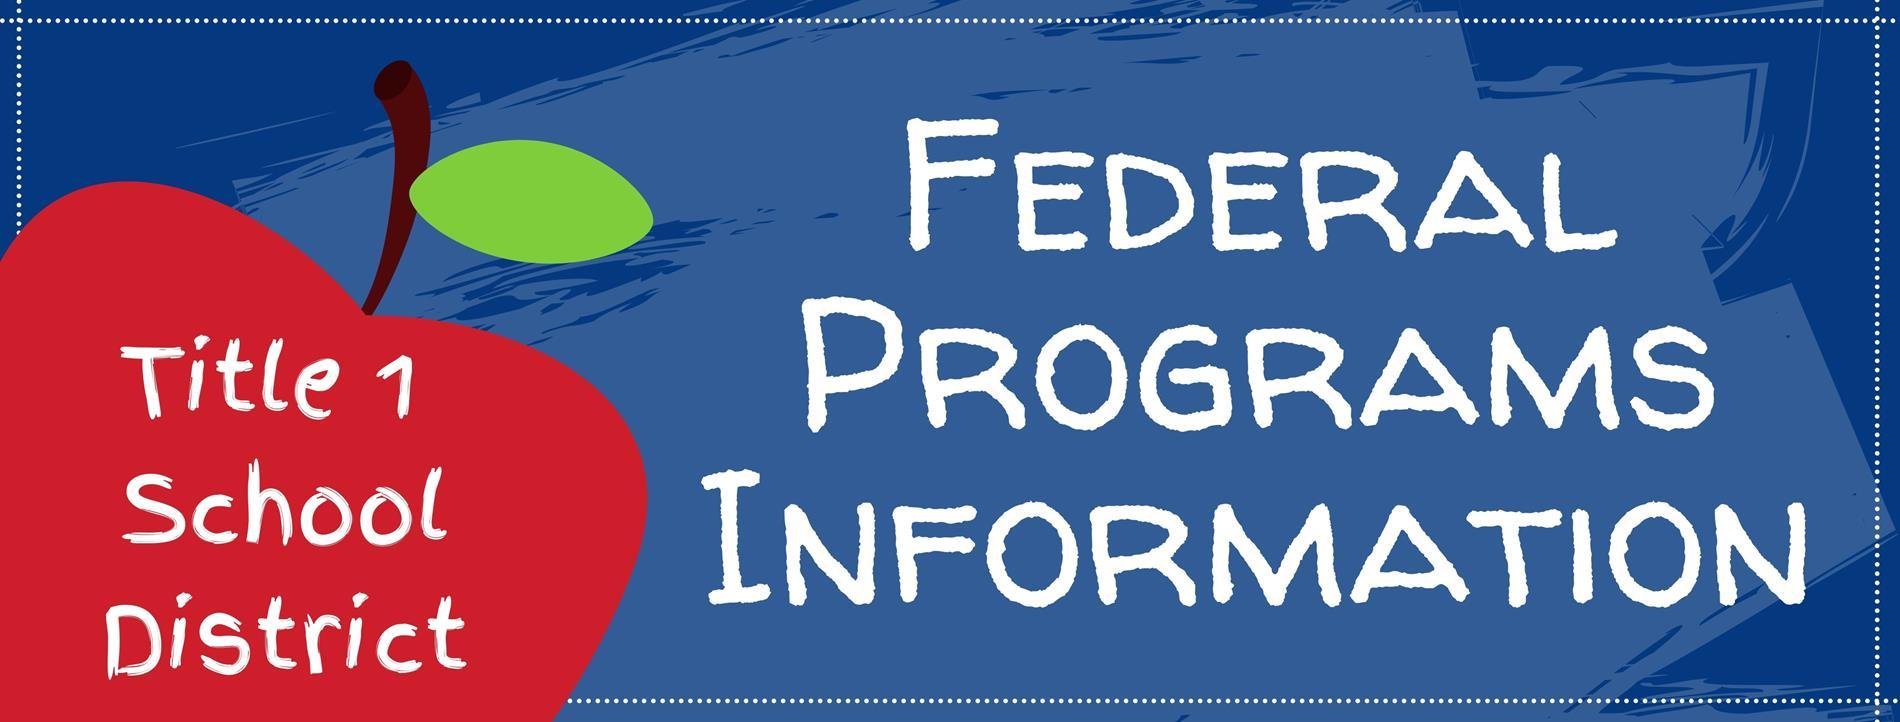 Federal Programs Banner